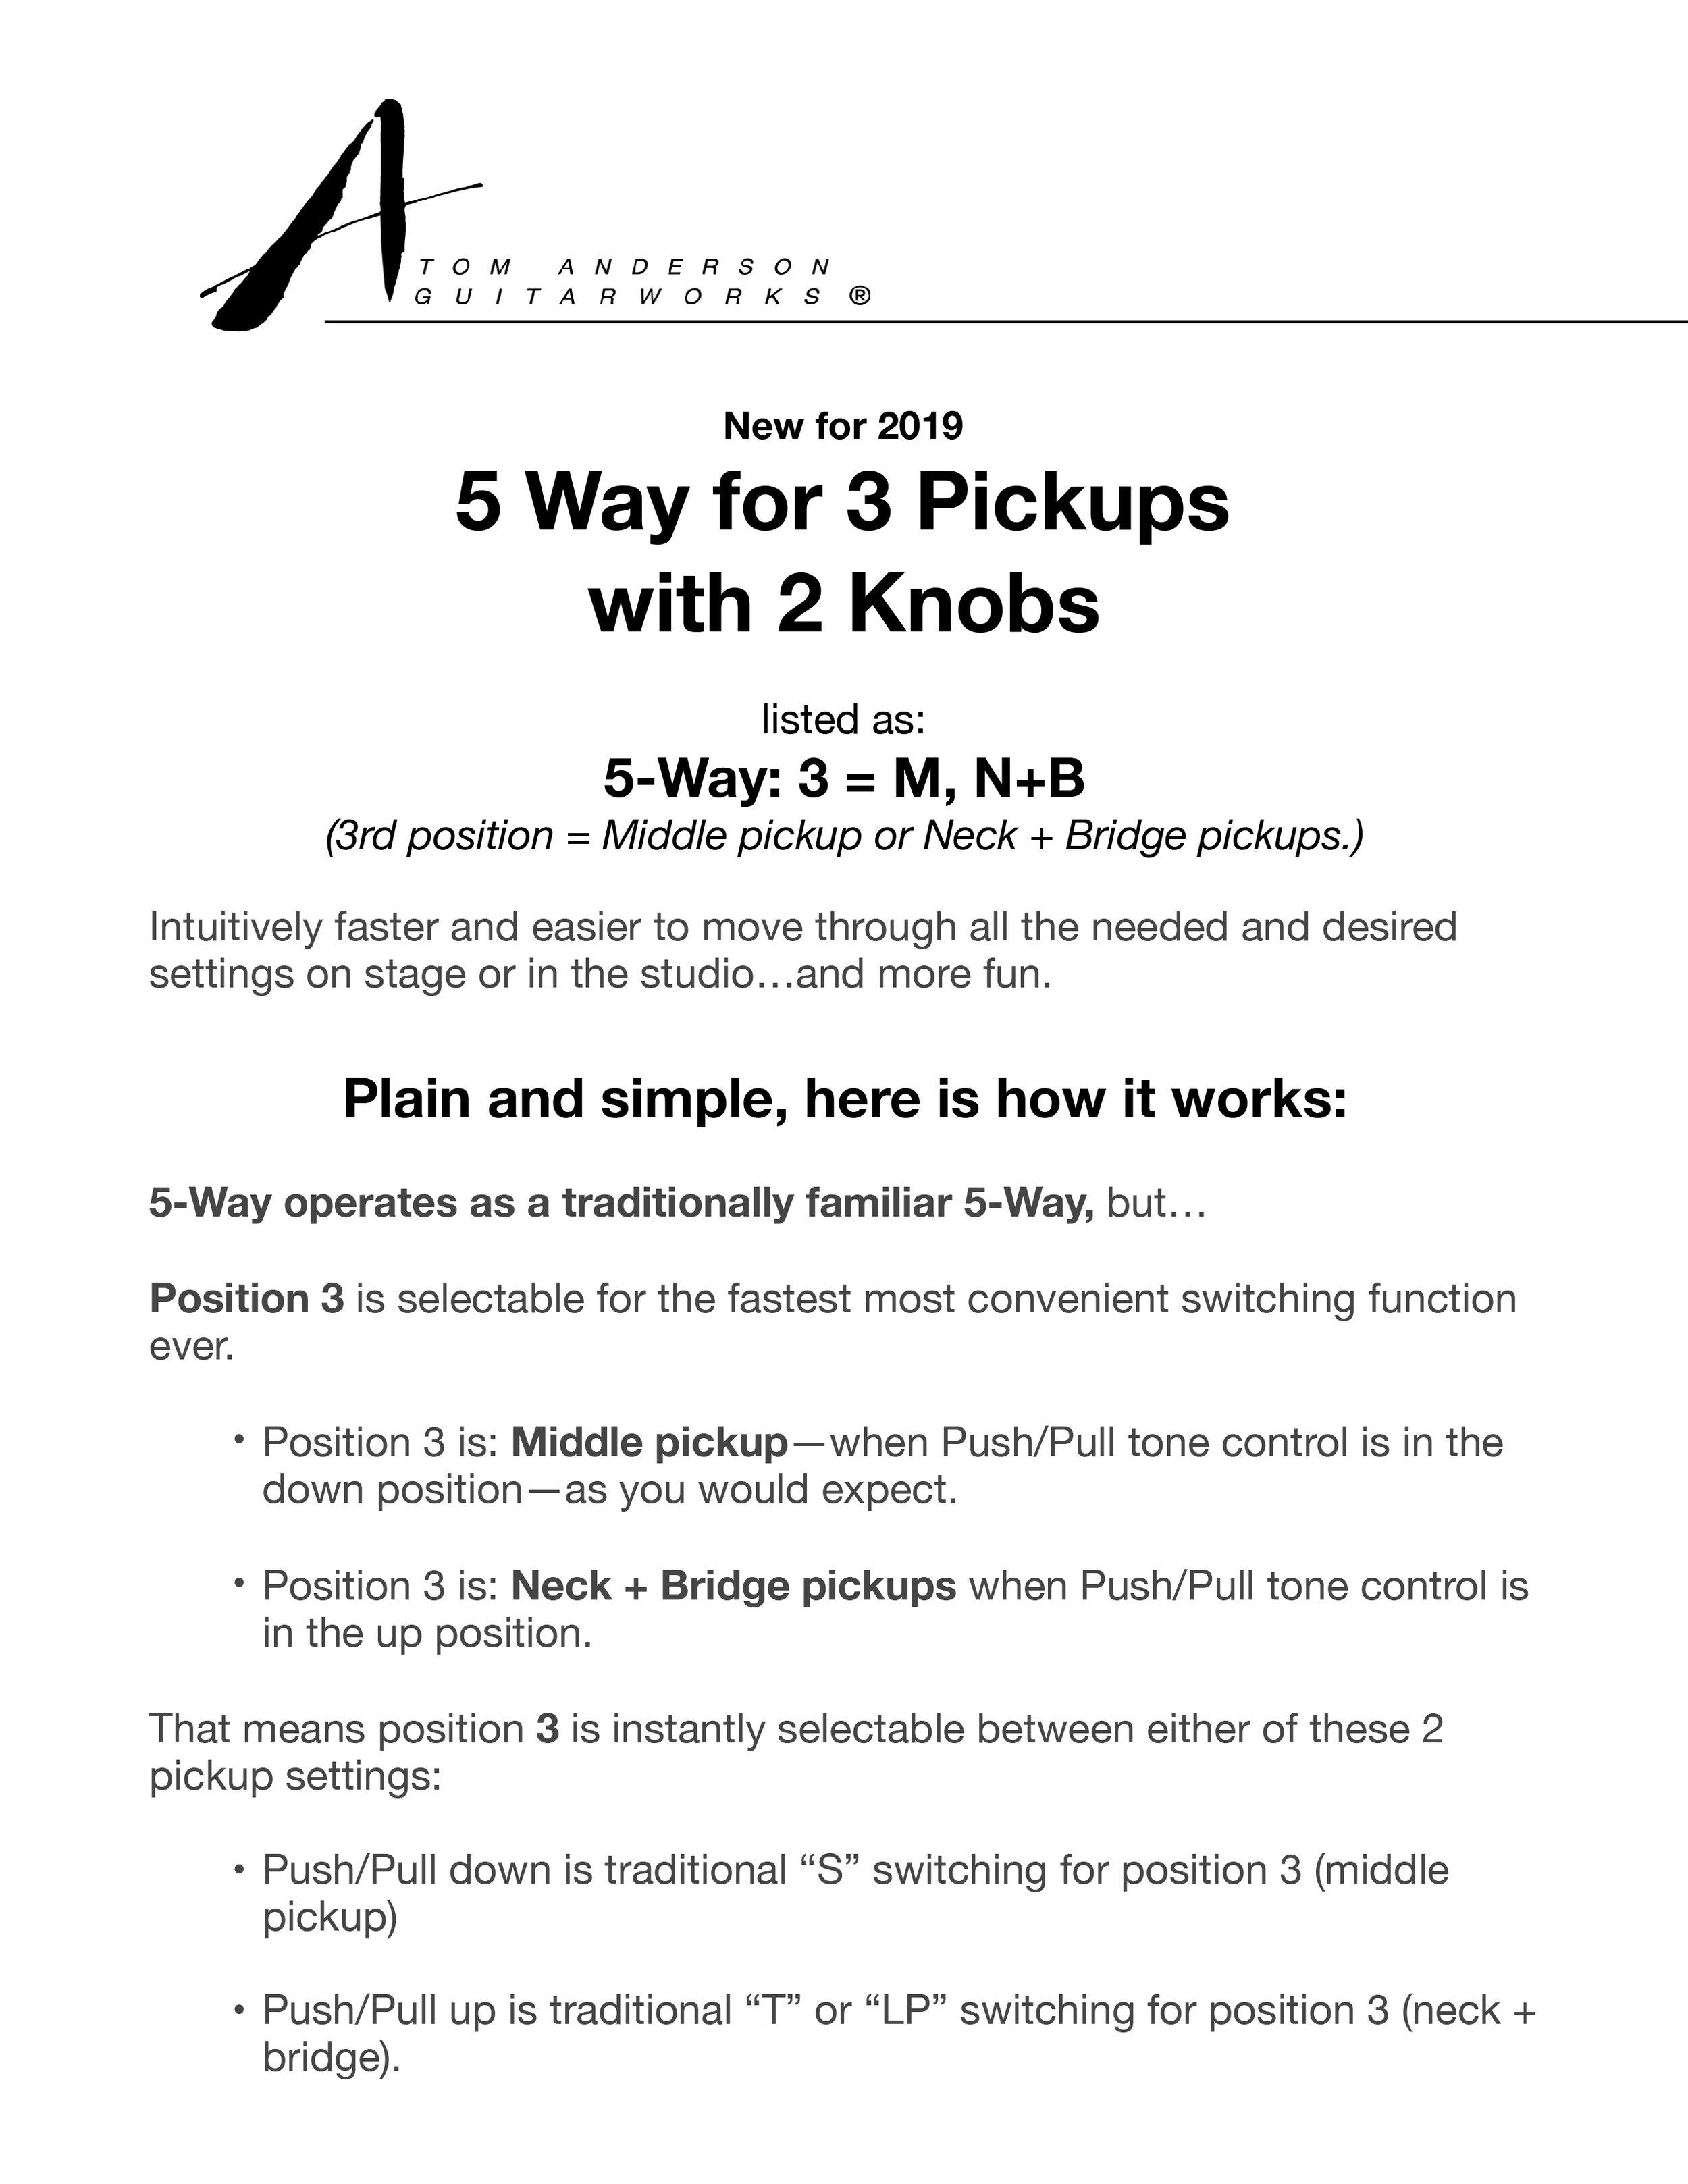 5-Way_3 PU_2 Knob - switching Function-1.jpg